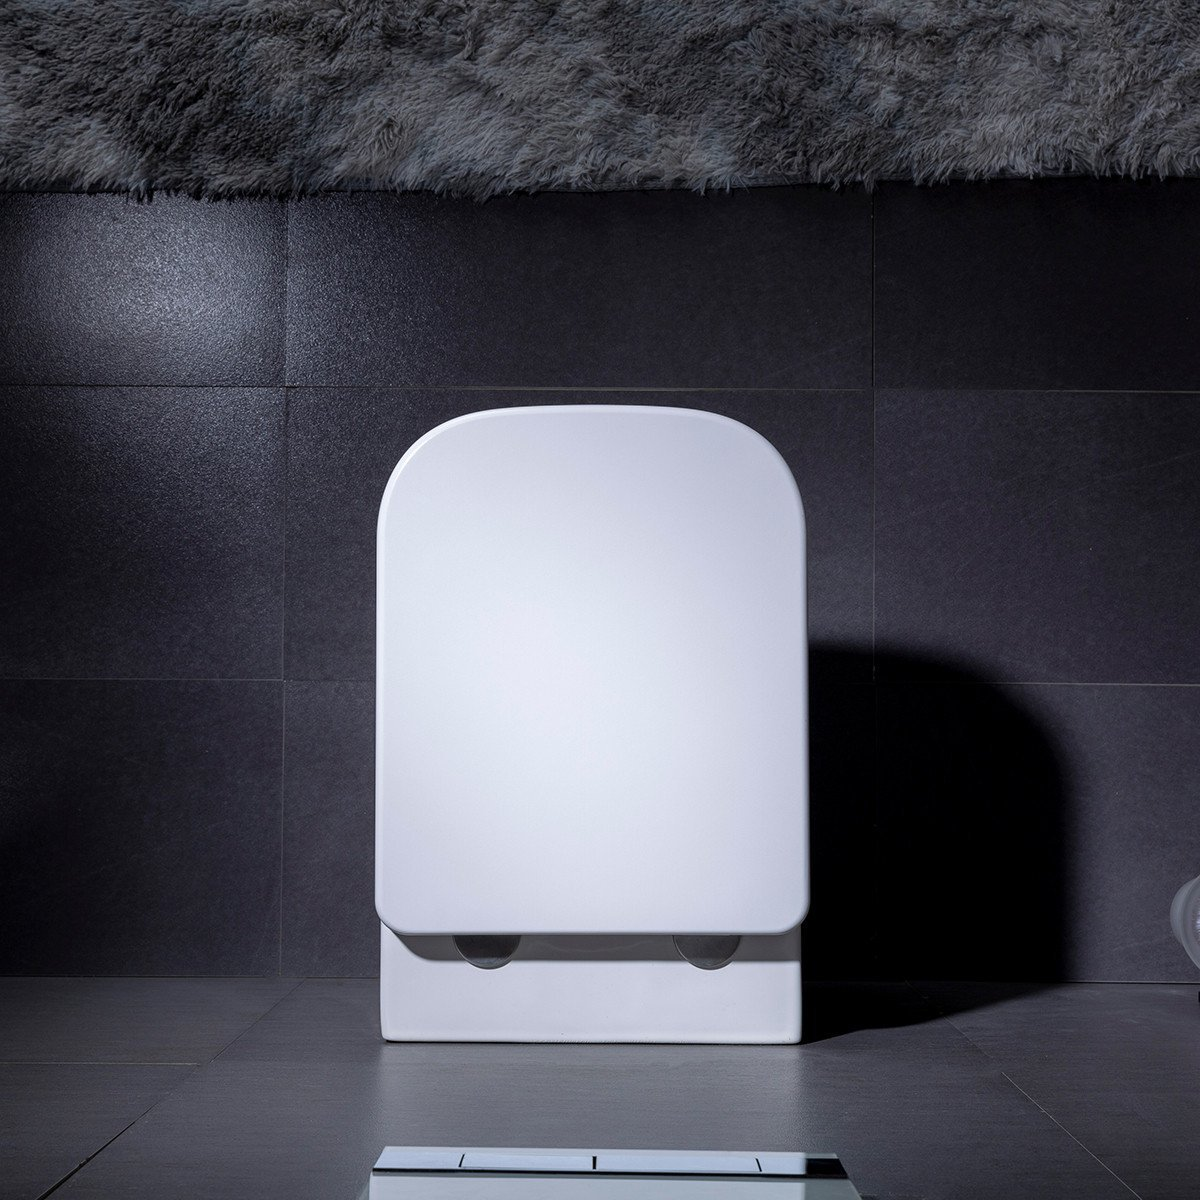 Montage Wc Pot.Wandcloset Hangend Toilet Alexandria Inbouwtoilet Rimfree Wc Pot